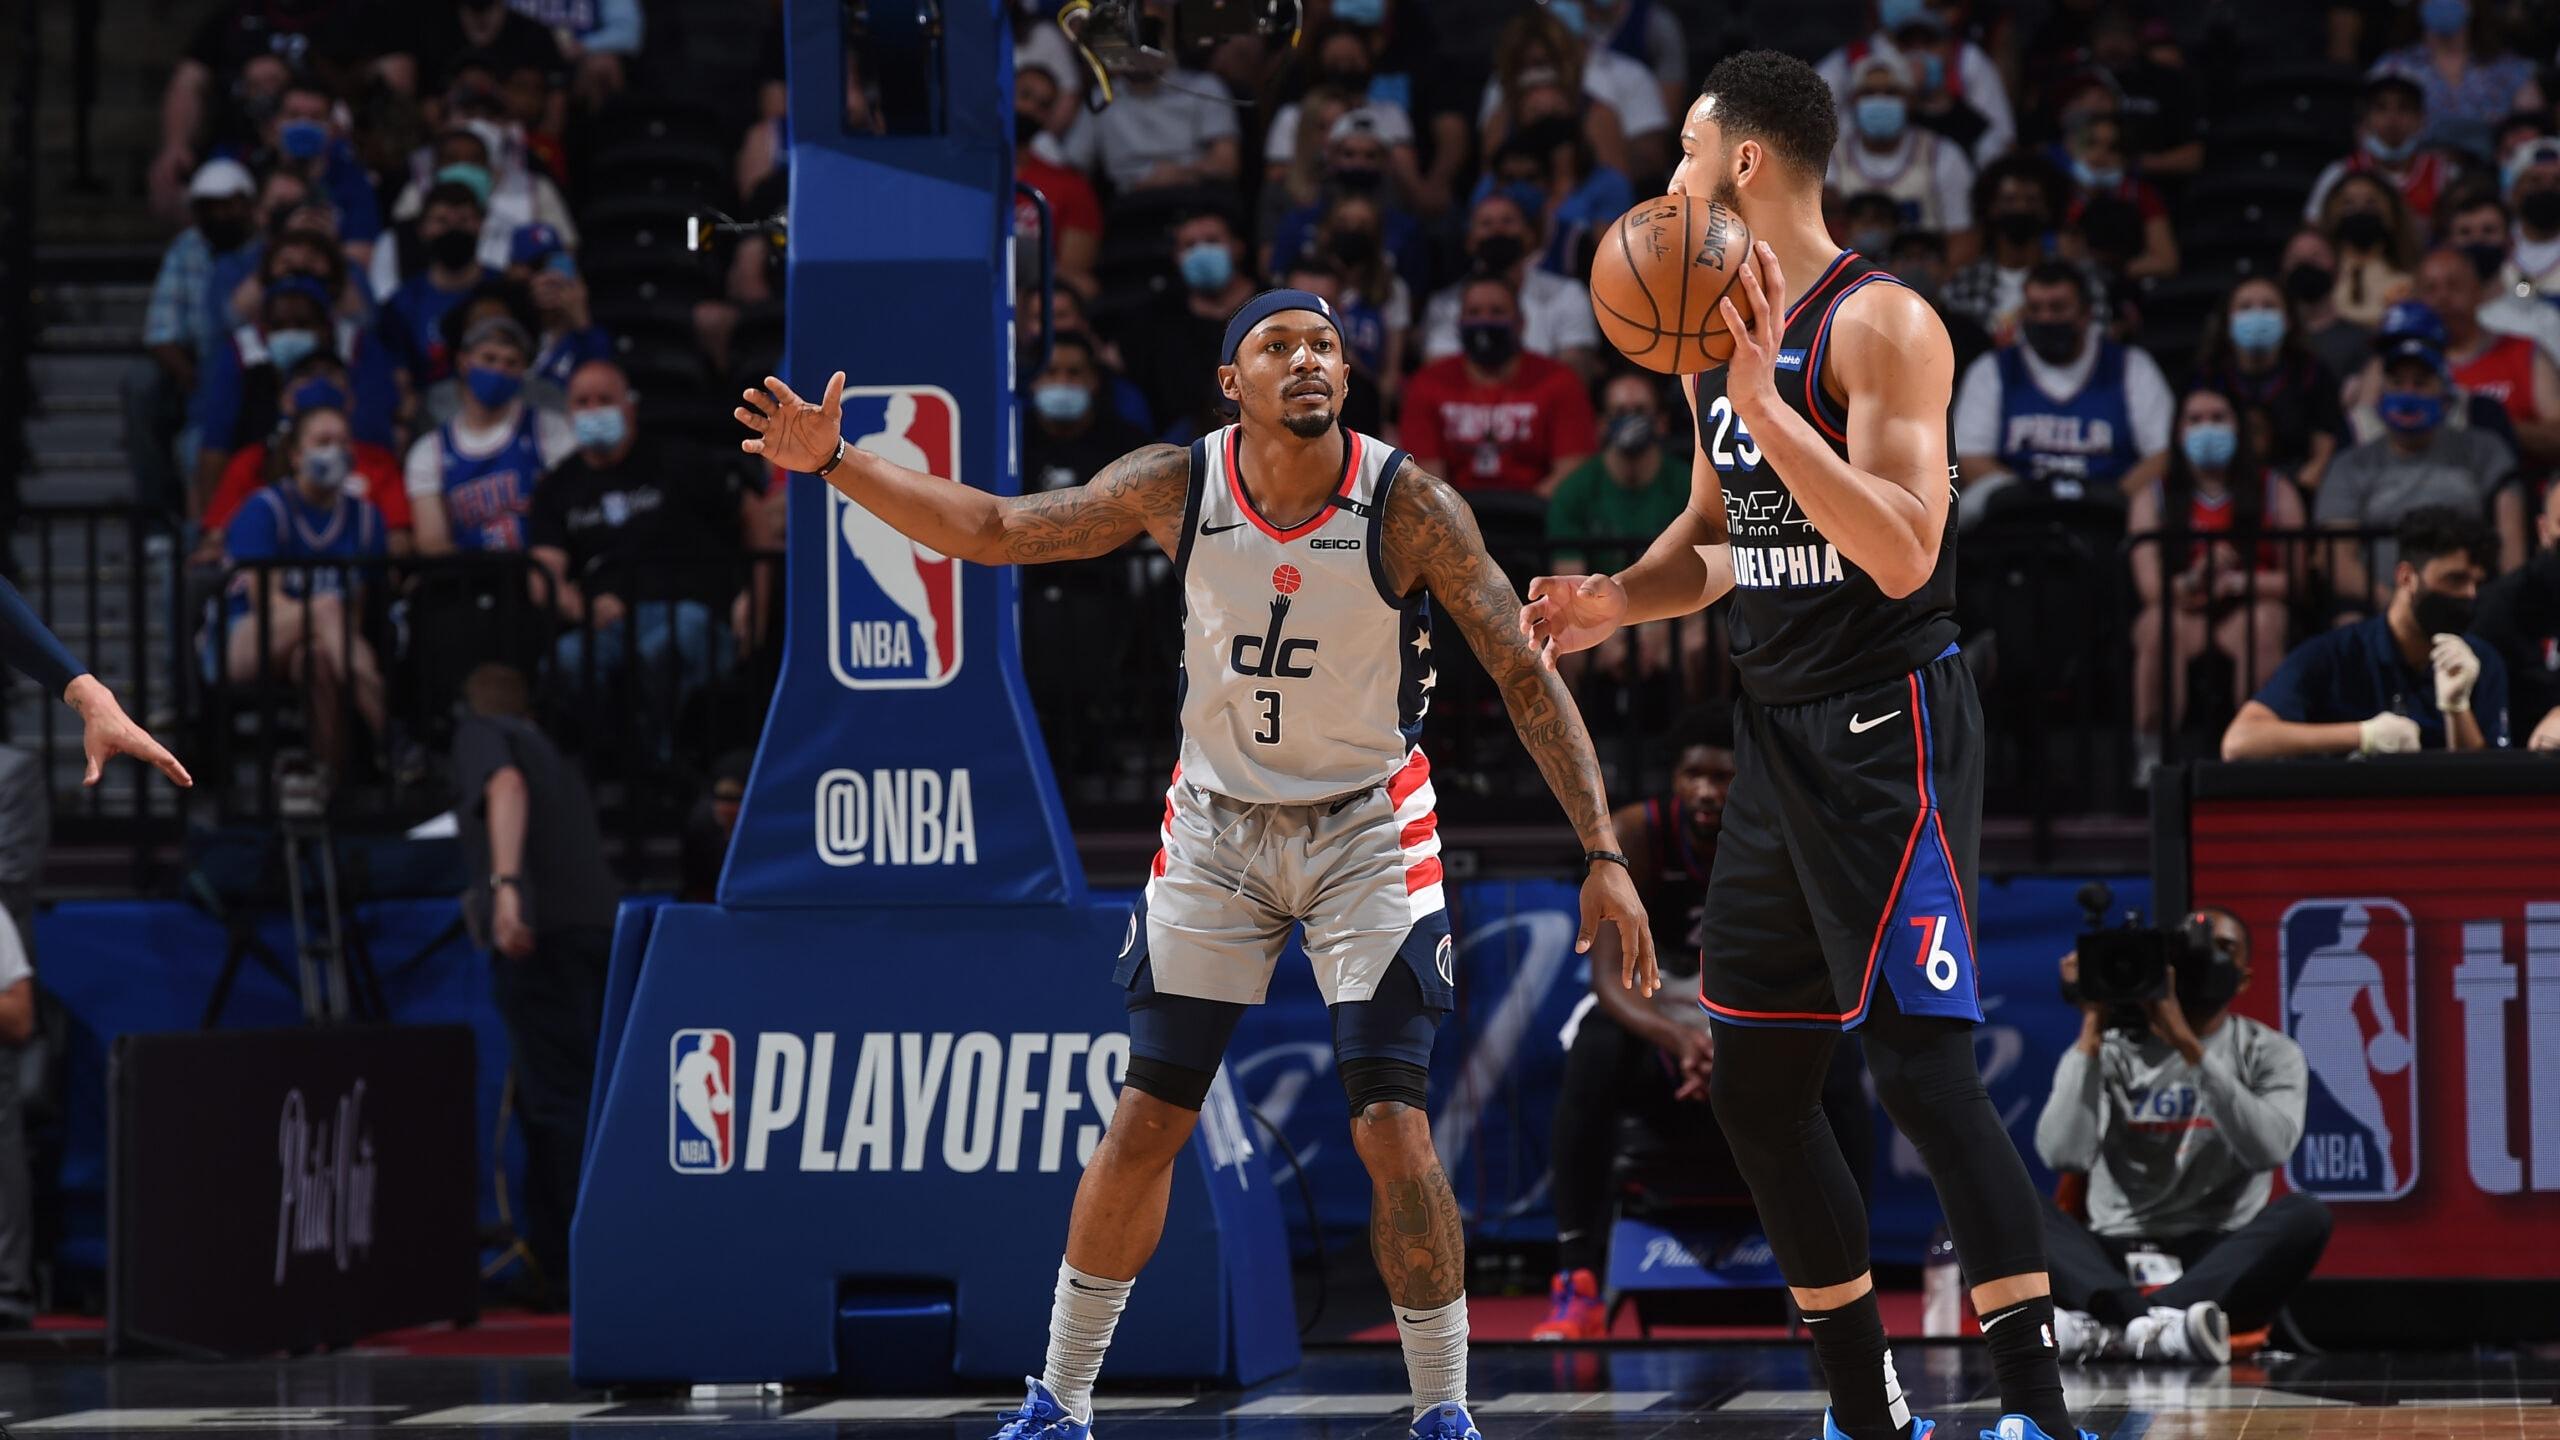 Game Recap: 76ers 125, Wizards 118